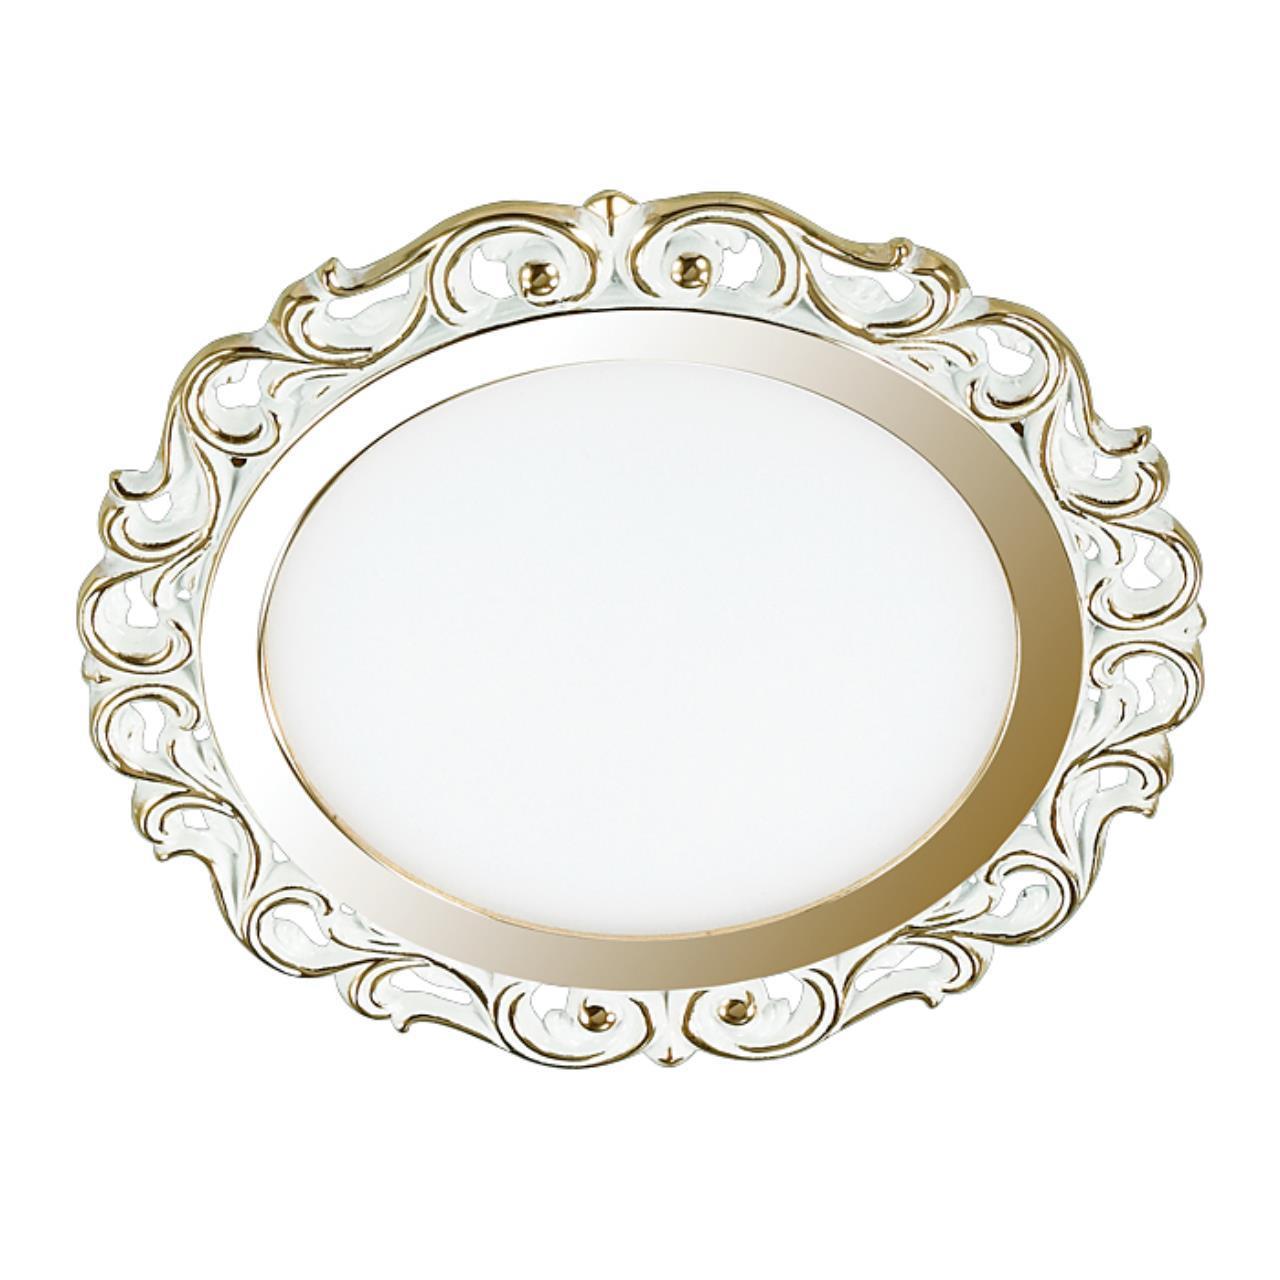 357263 SPOT NT16 418 белый/золото Встраиваемый светильник IP20 LED 3000К 9W 220-240V PEILI